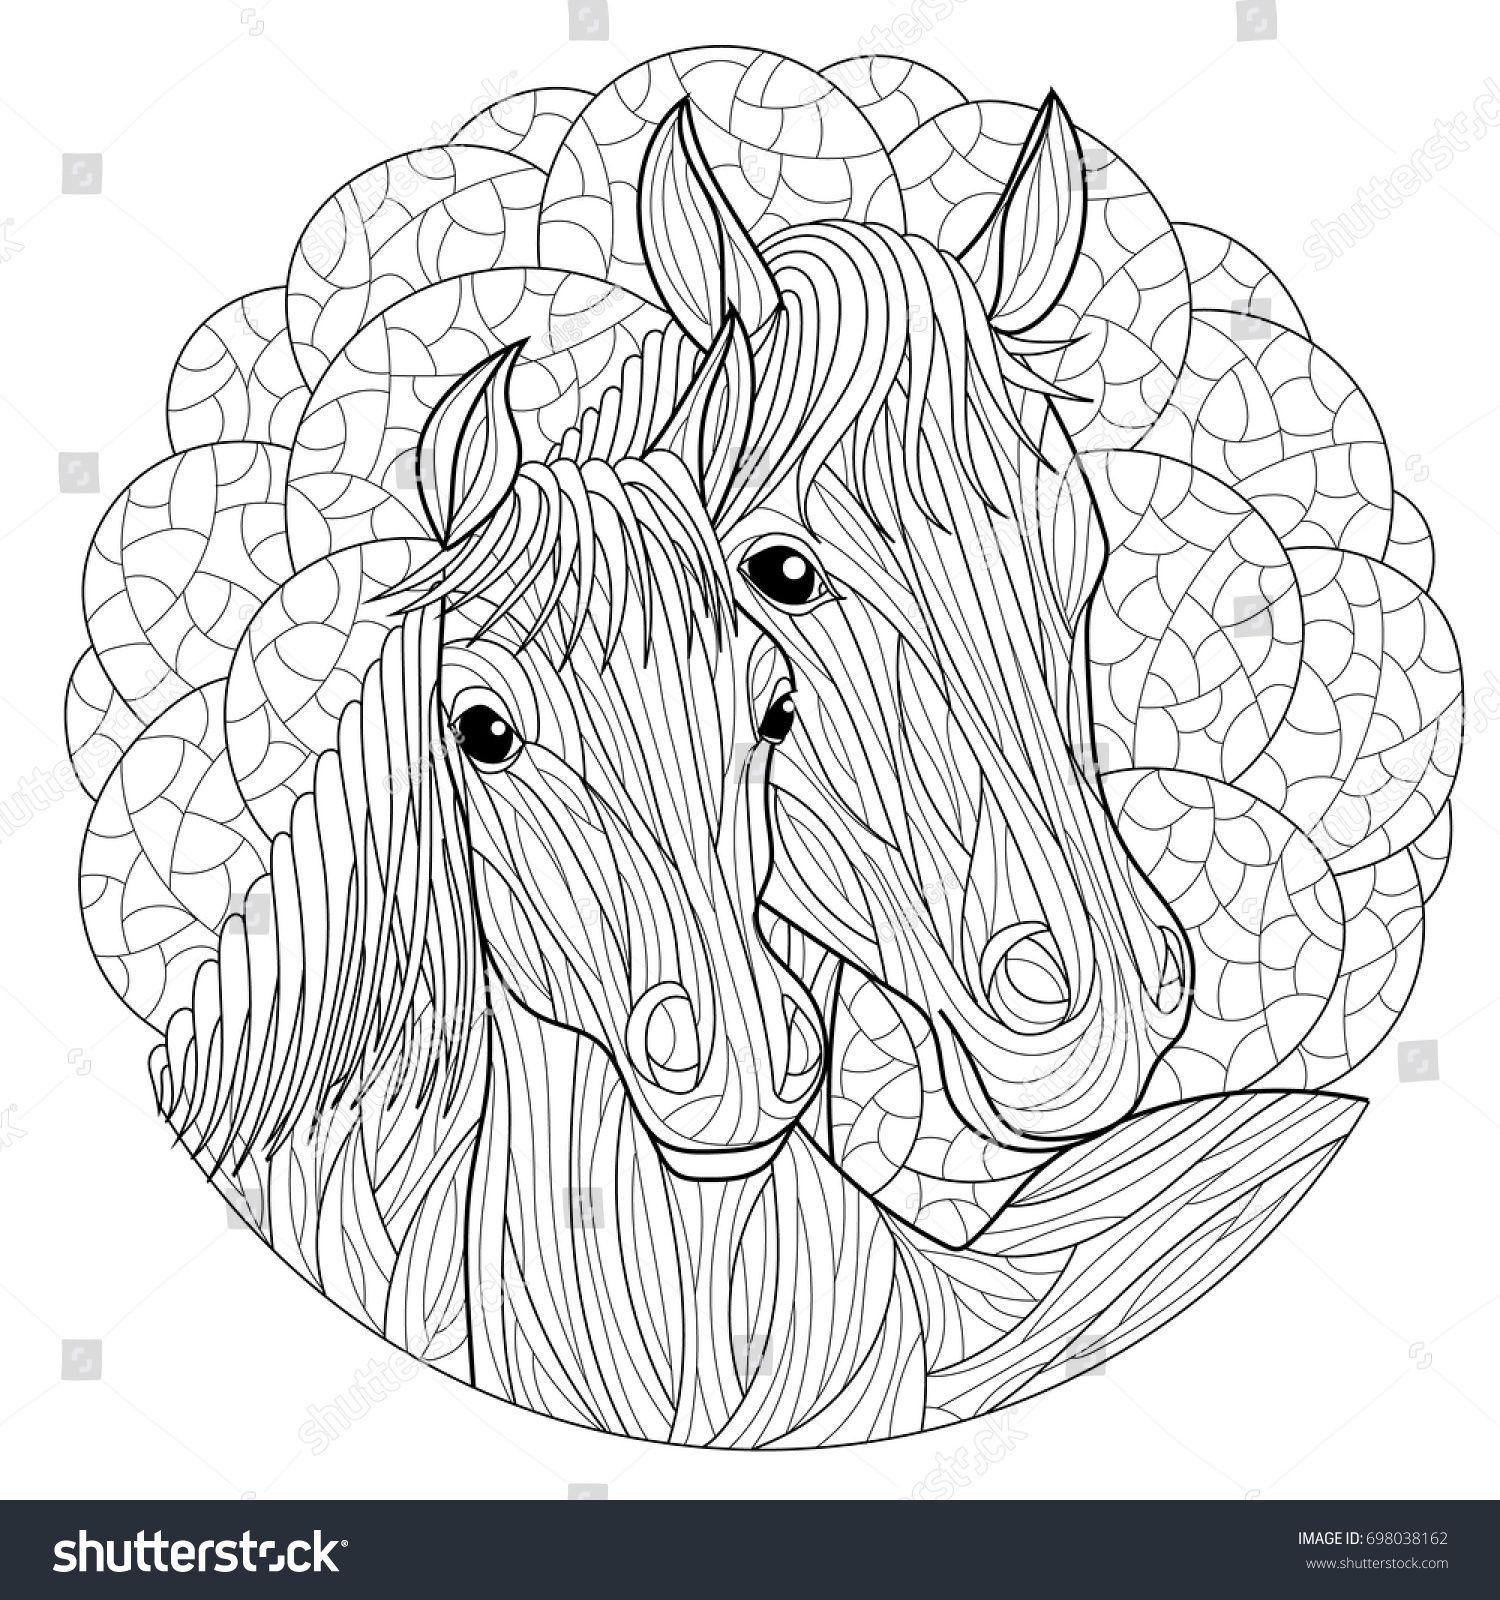 Pin Von Barbara Auf Coloring Horse Zebra In 2020